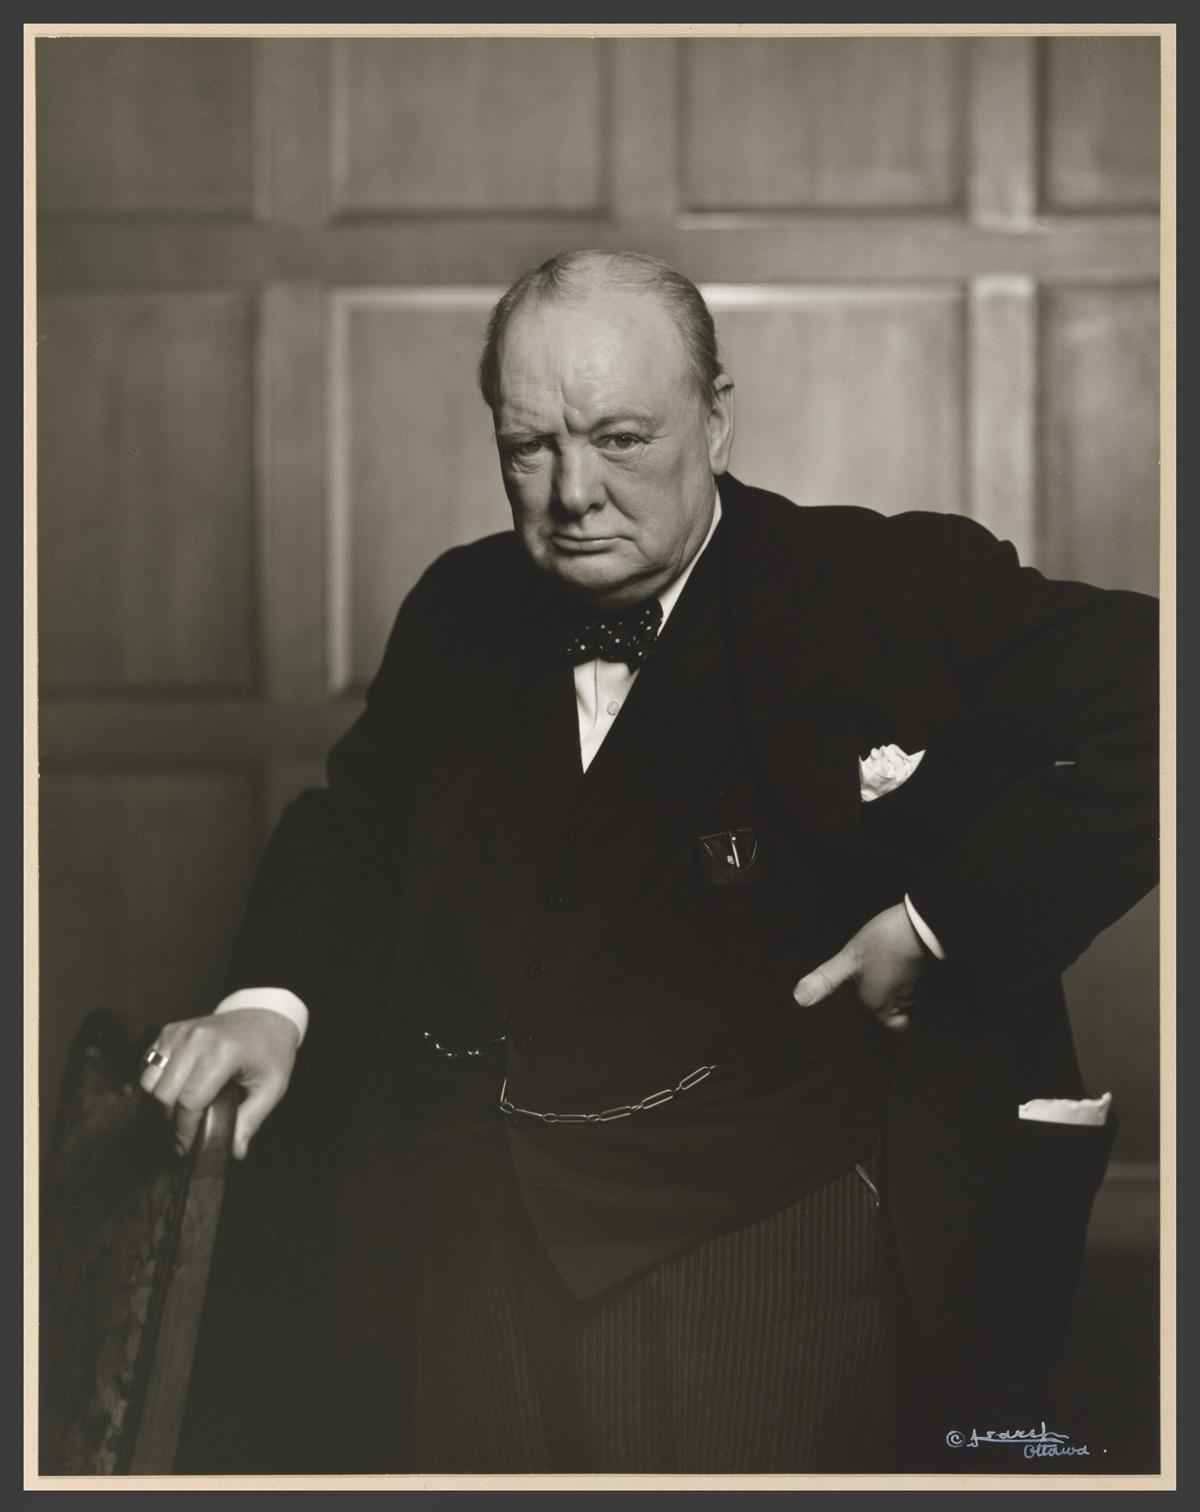 Winston Churchill Biography